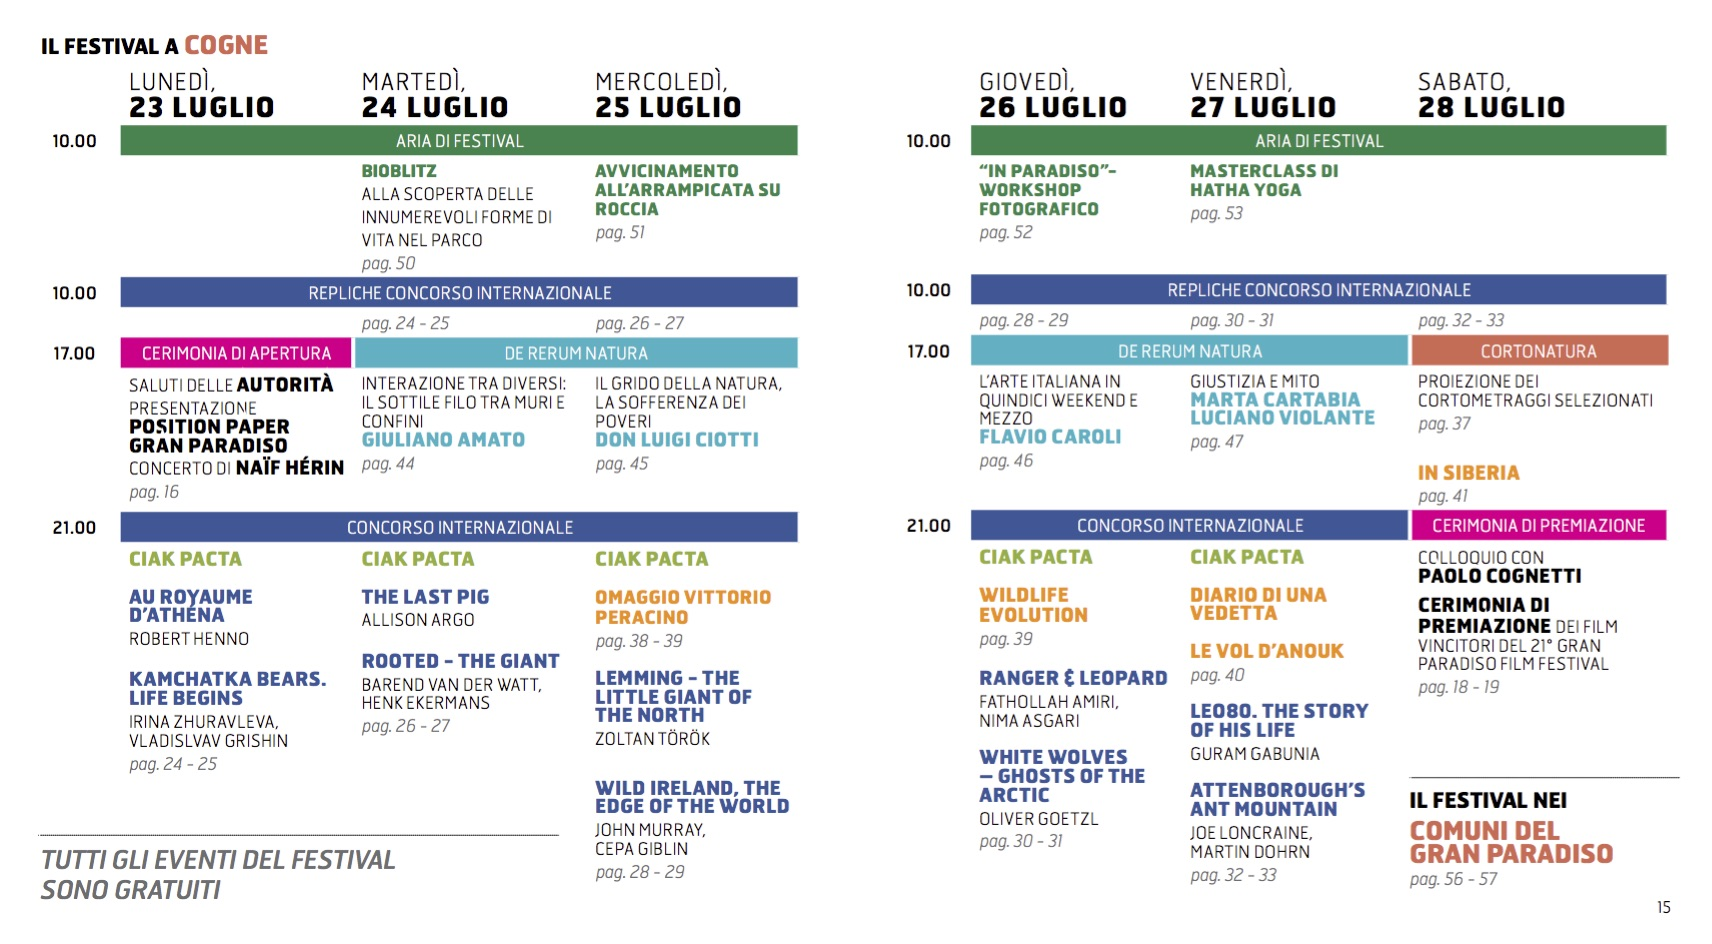 GPFF21 Programma Cogne